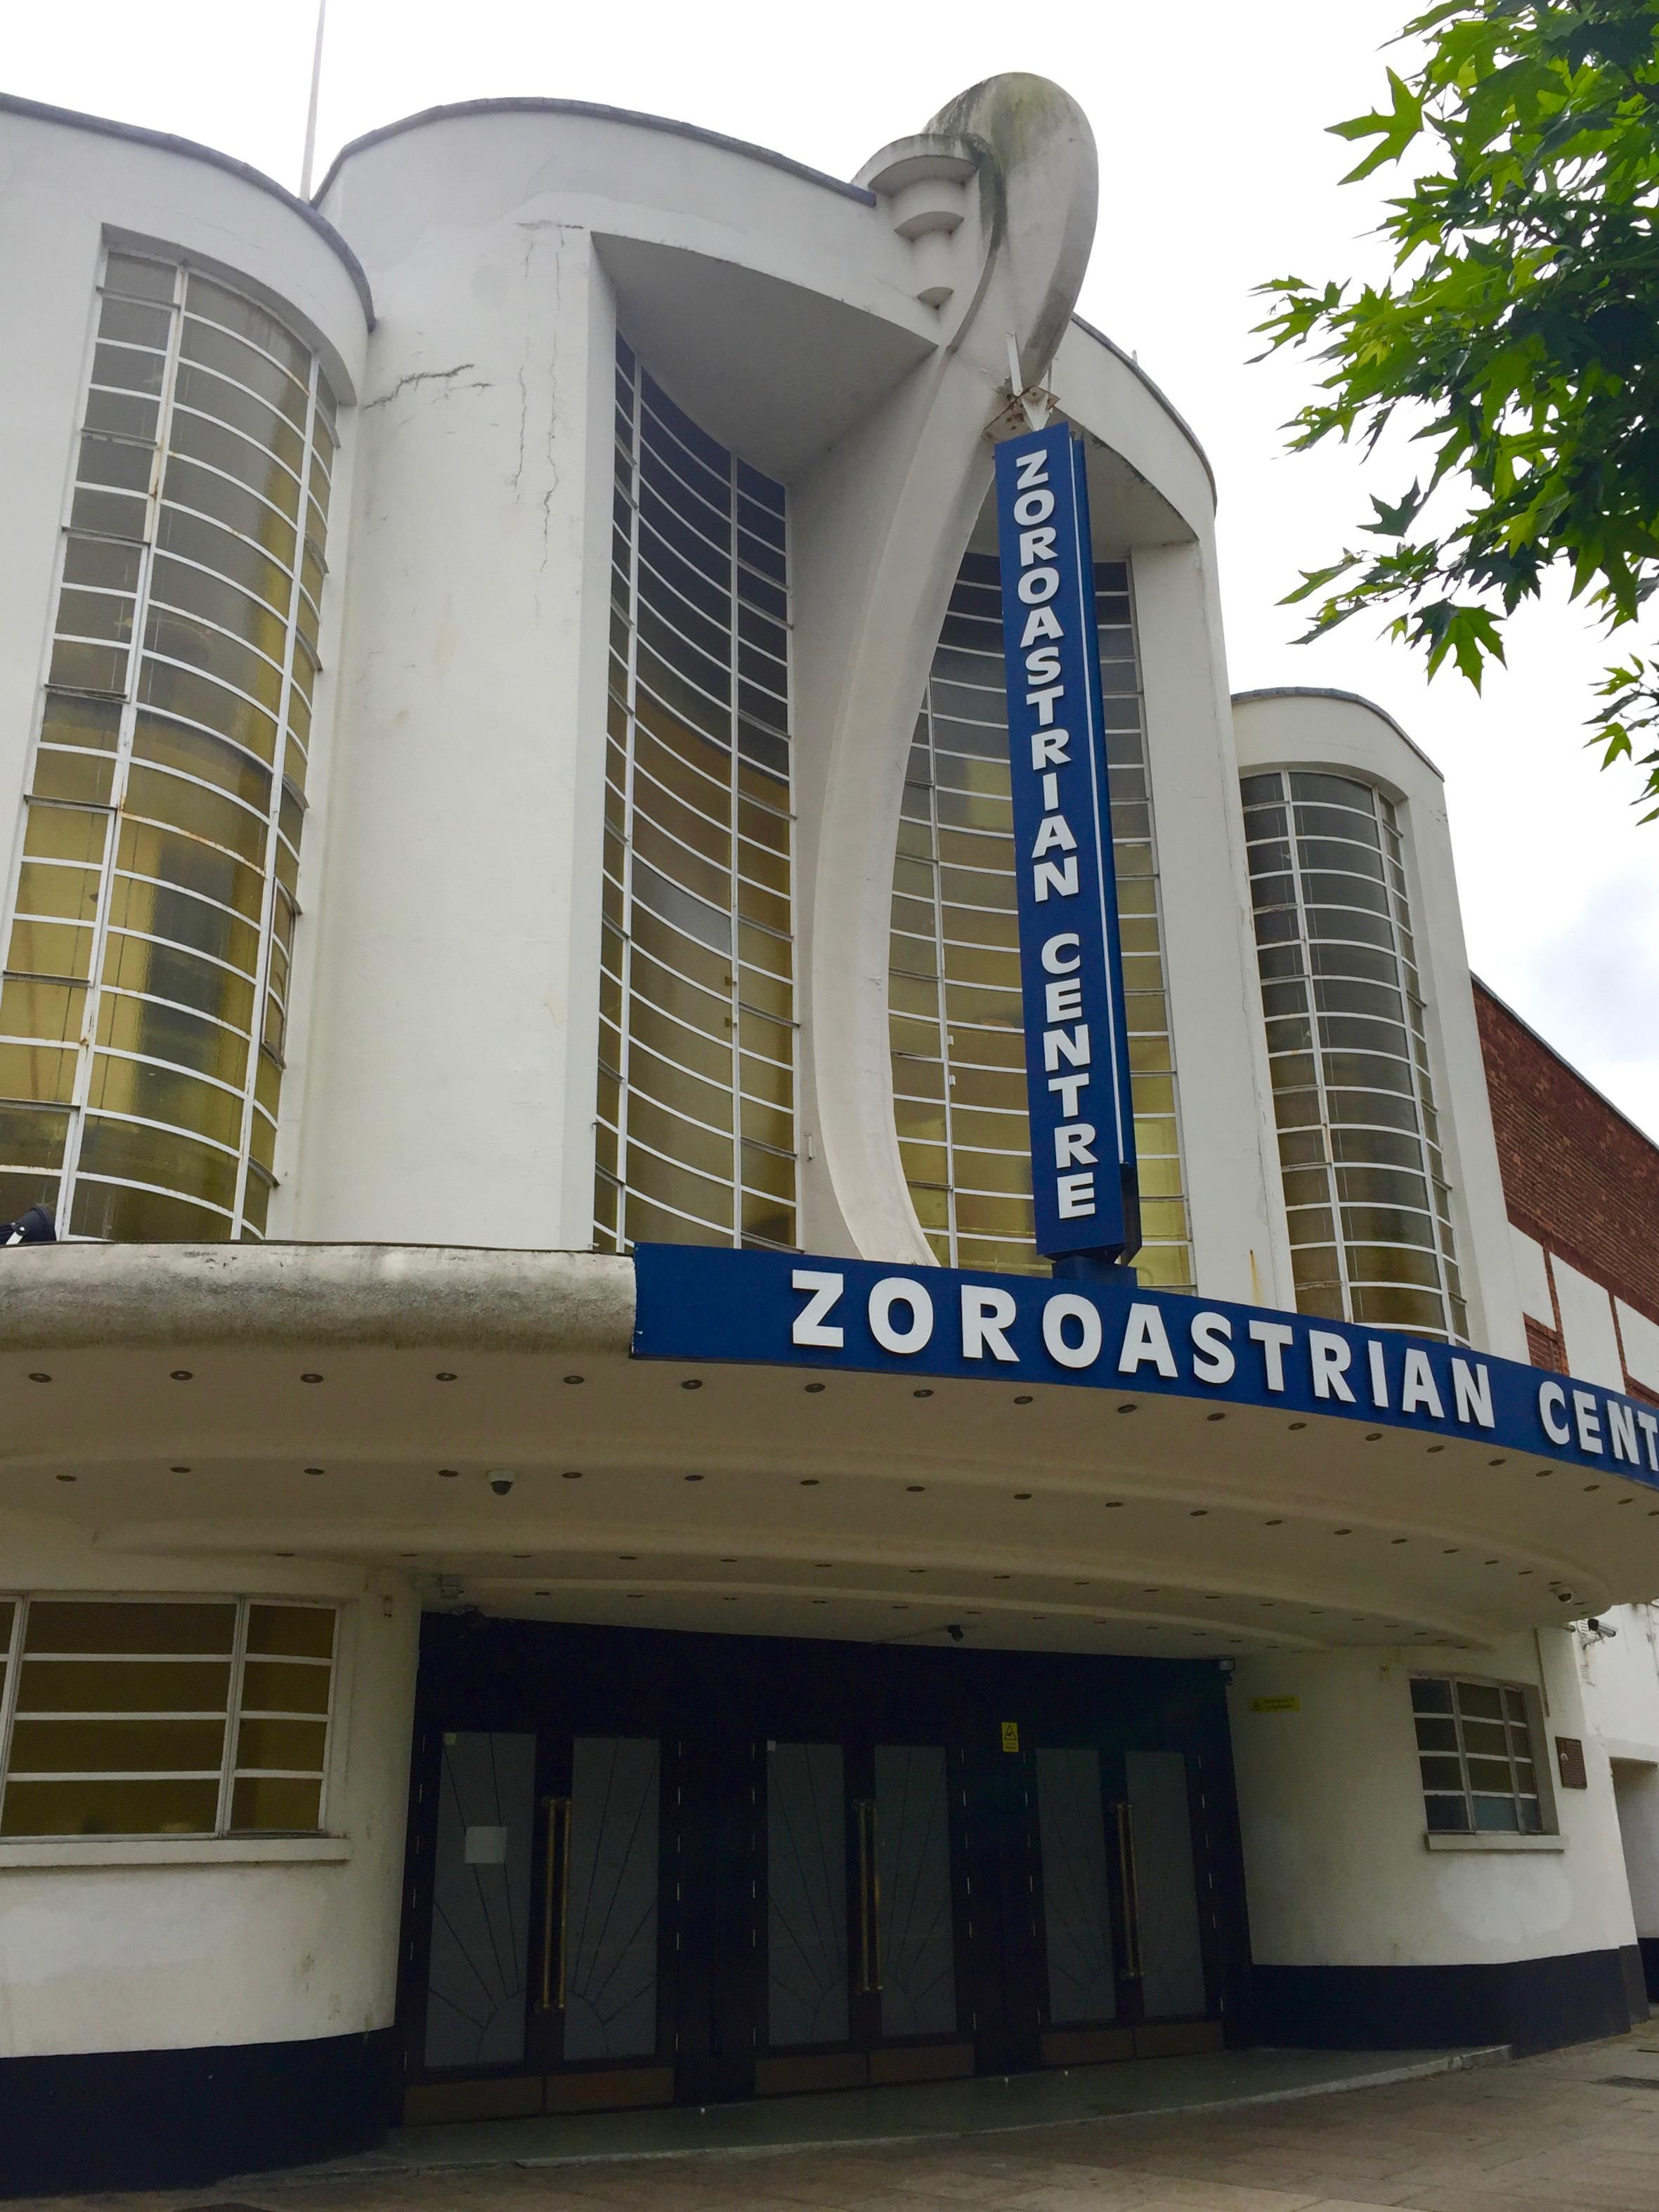 The Zoroastrian Centre at Rayners Lane.